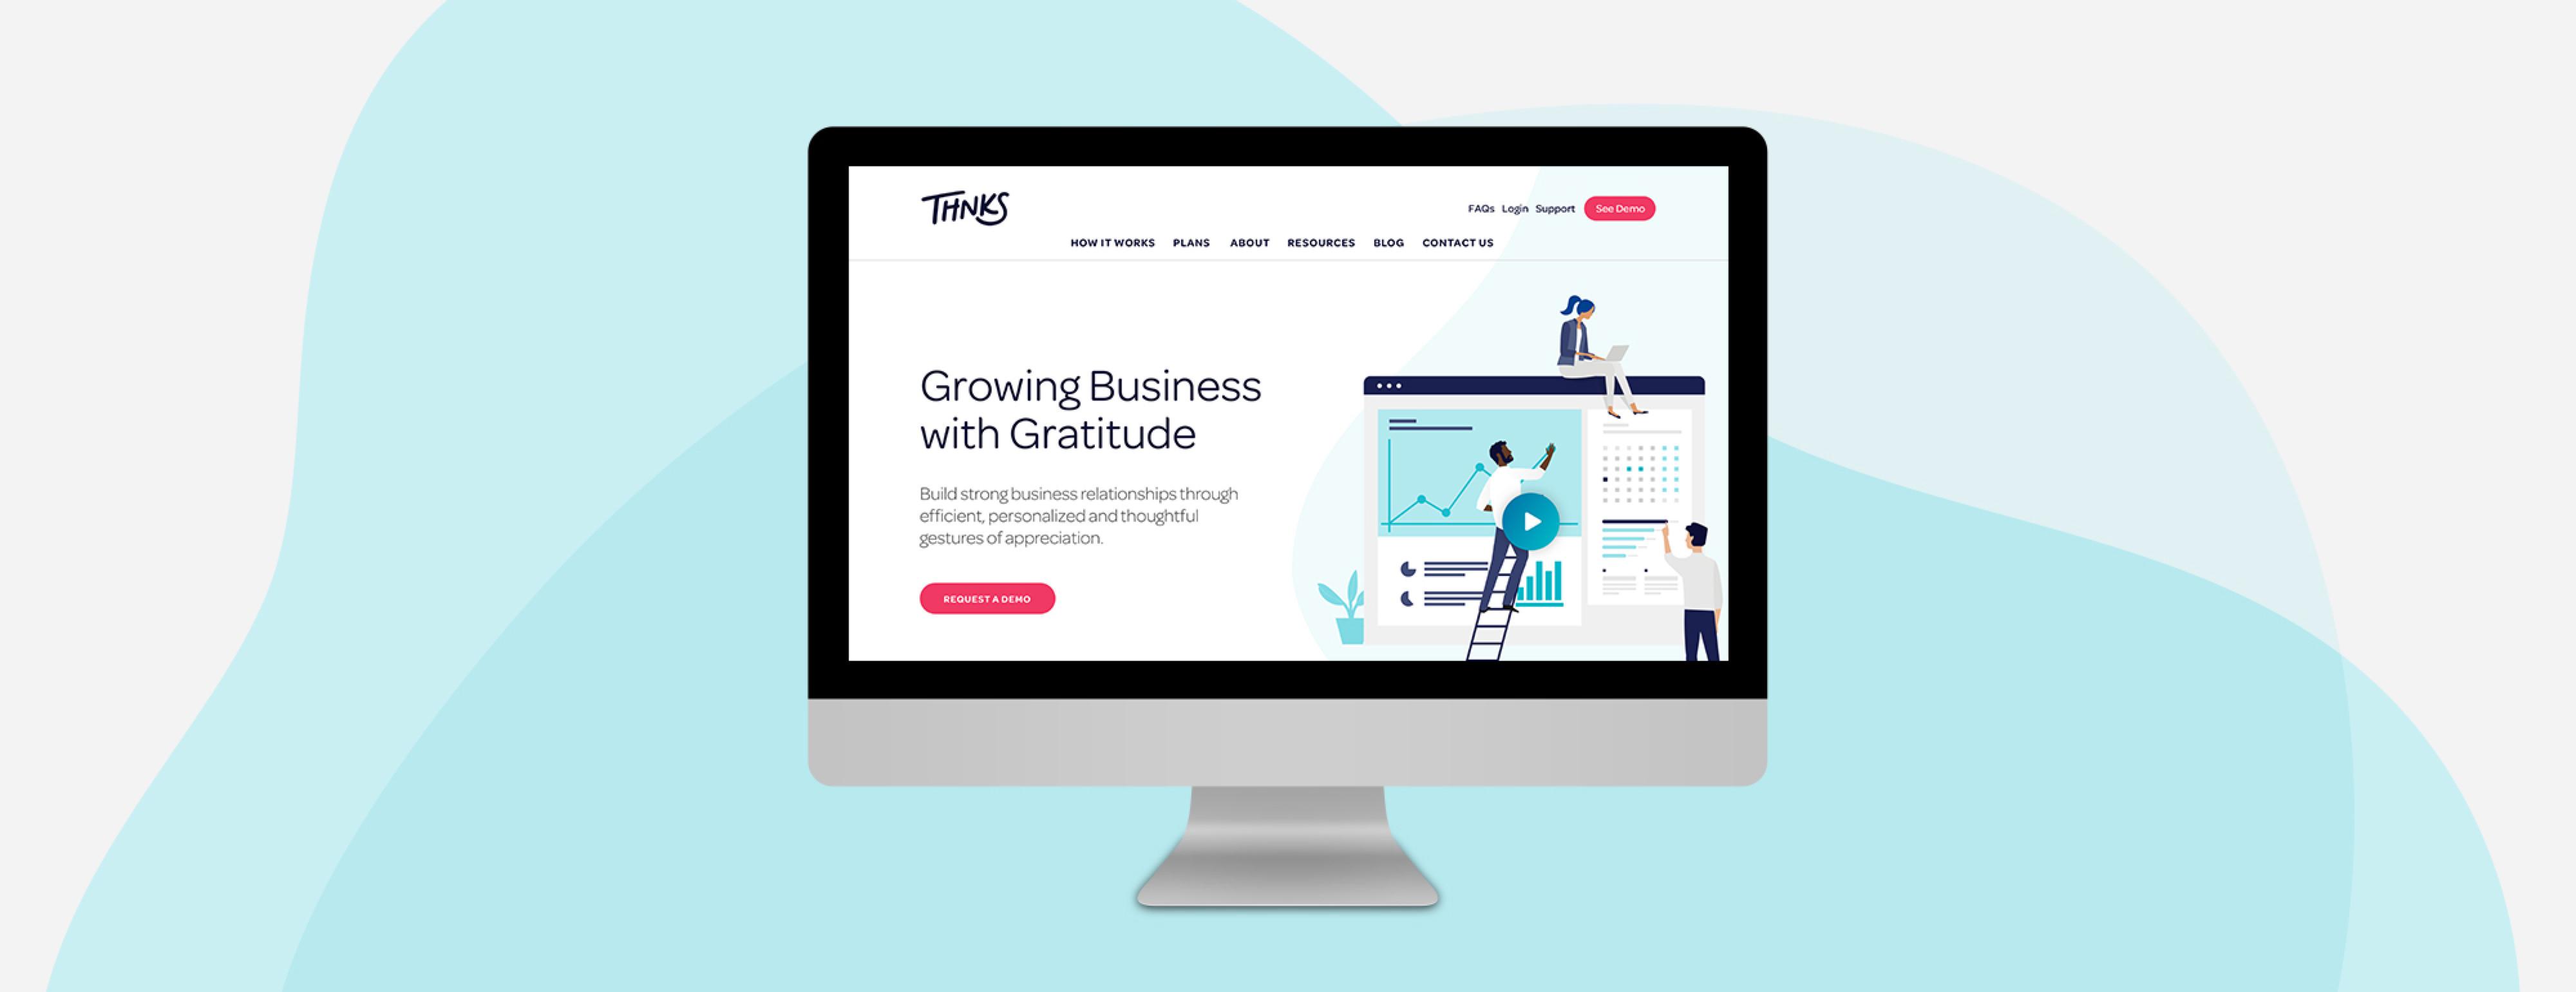 Thnks website design on imac